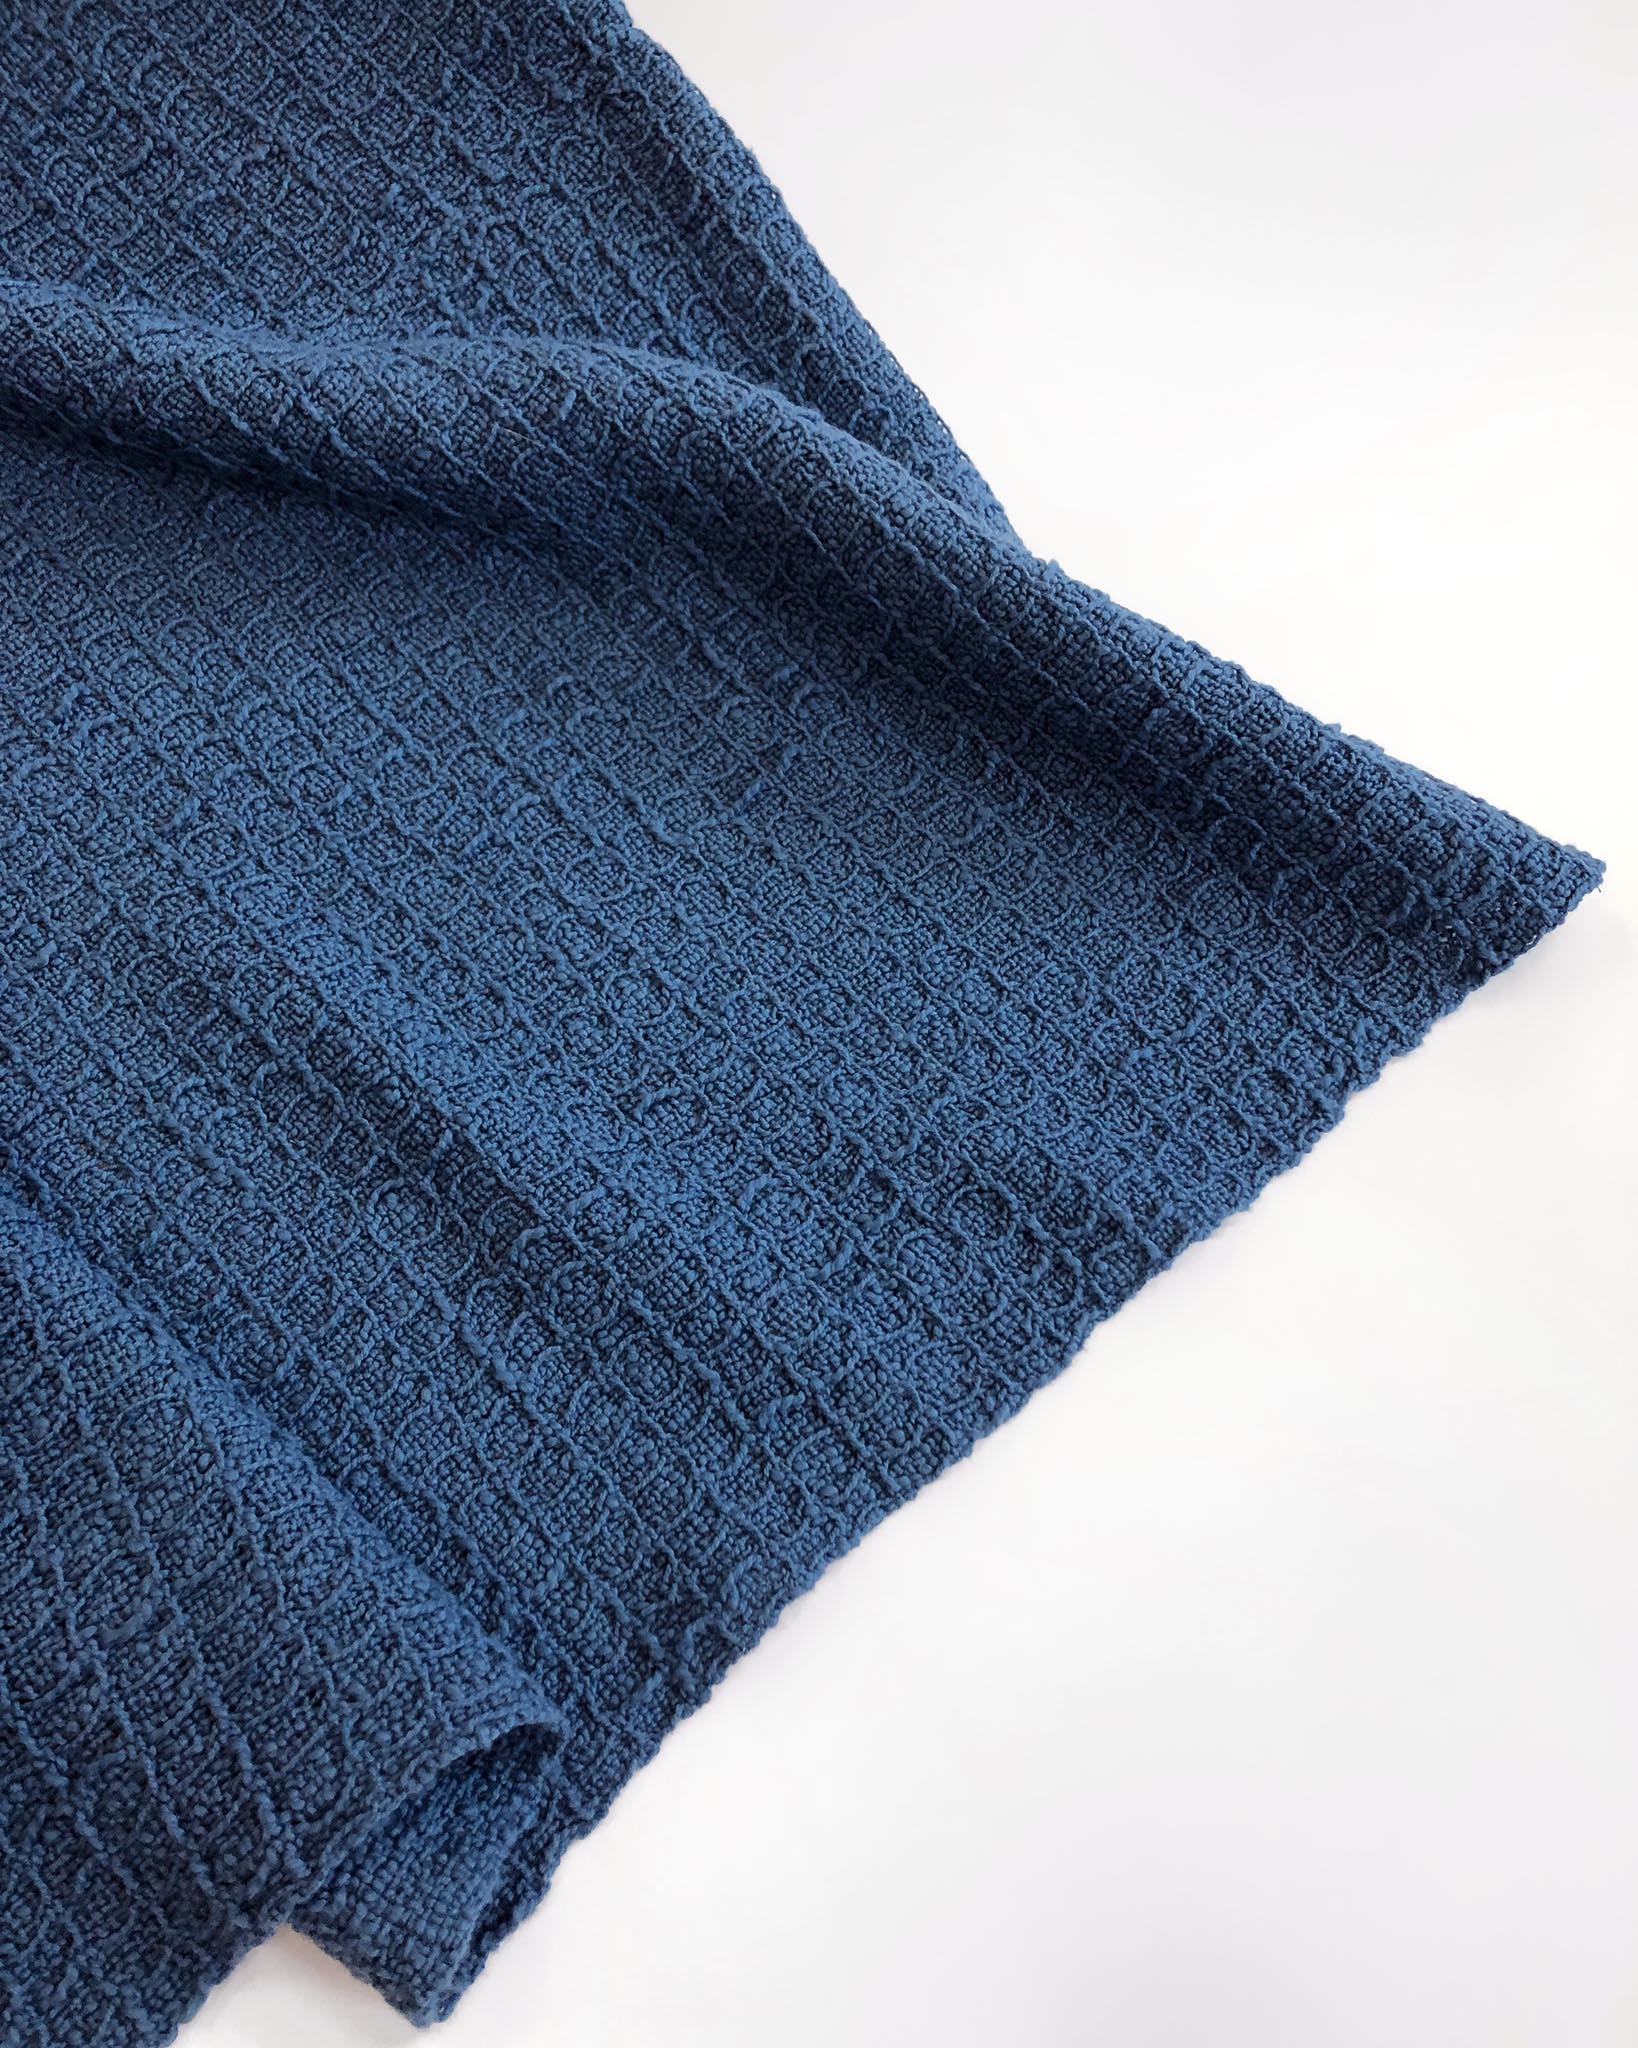 Free Pattern Waffle Weave Blanket on a Rigid Heddle Loom